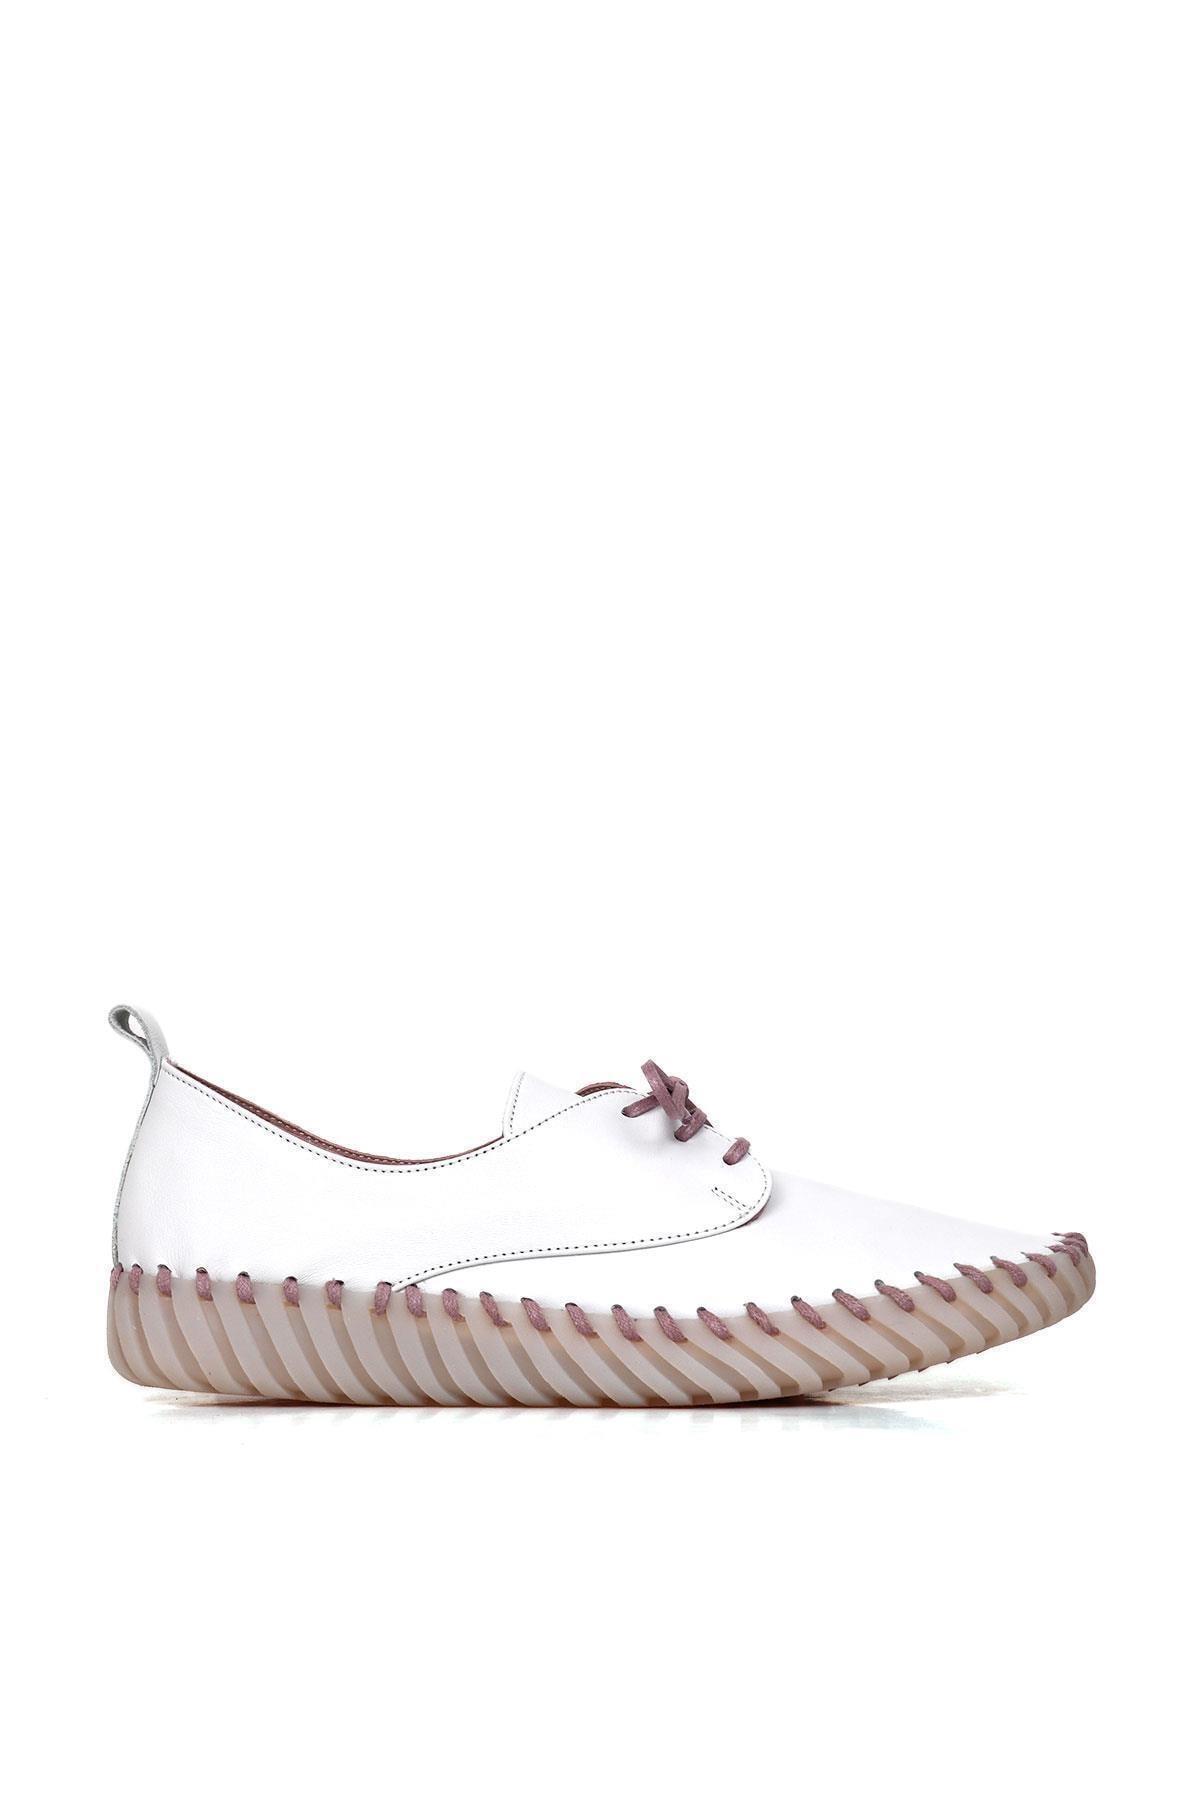 BUENO Shoes Kadın Spor 20wq0200 2